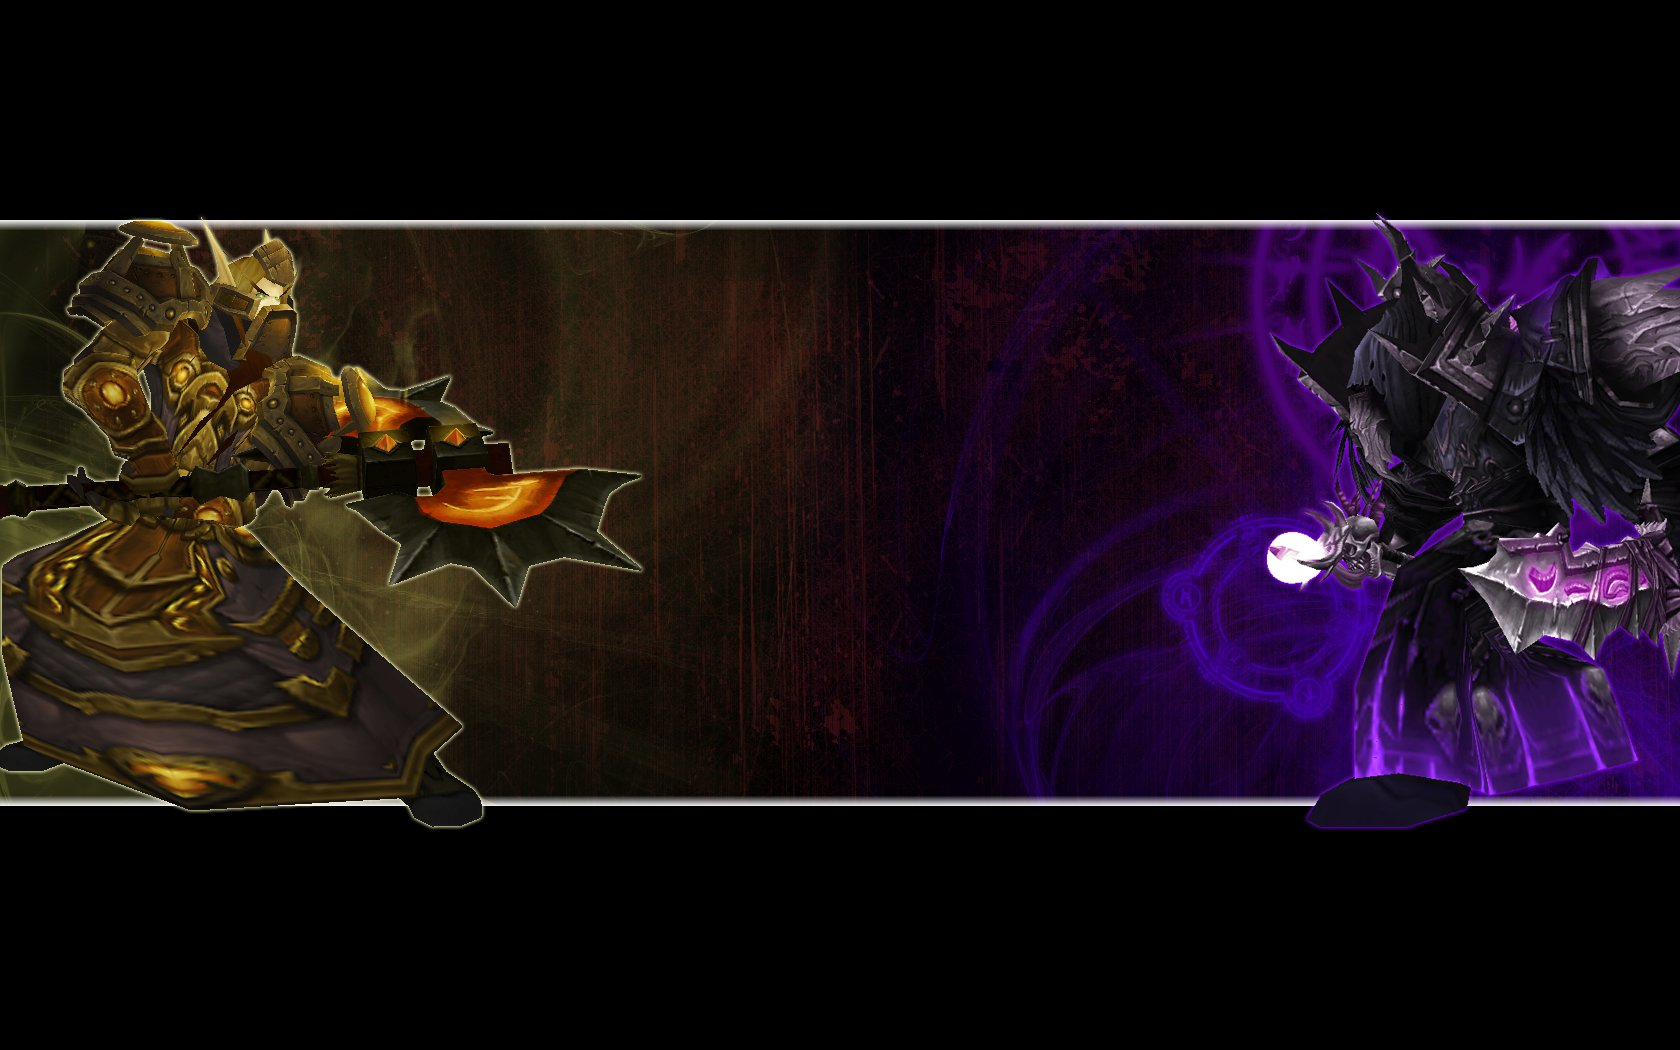 World of Warcraft Wallpaper by Cazylein 1680x1050